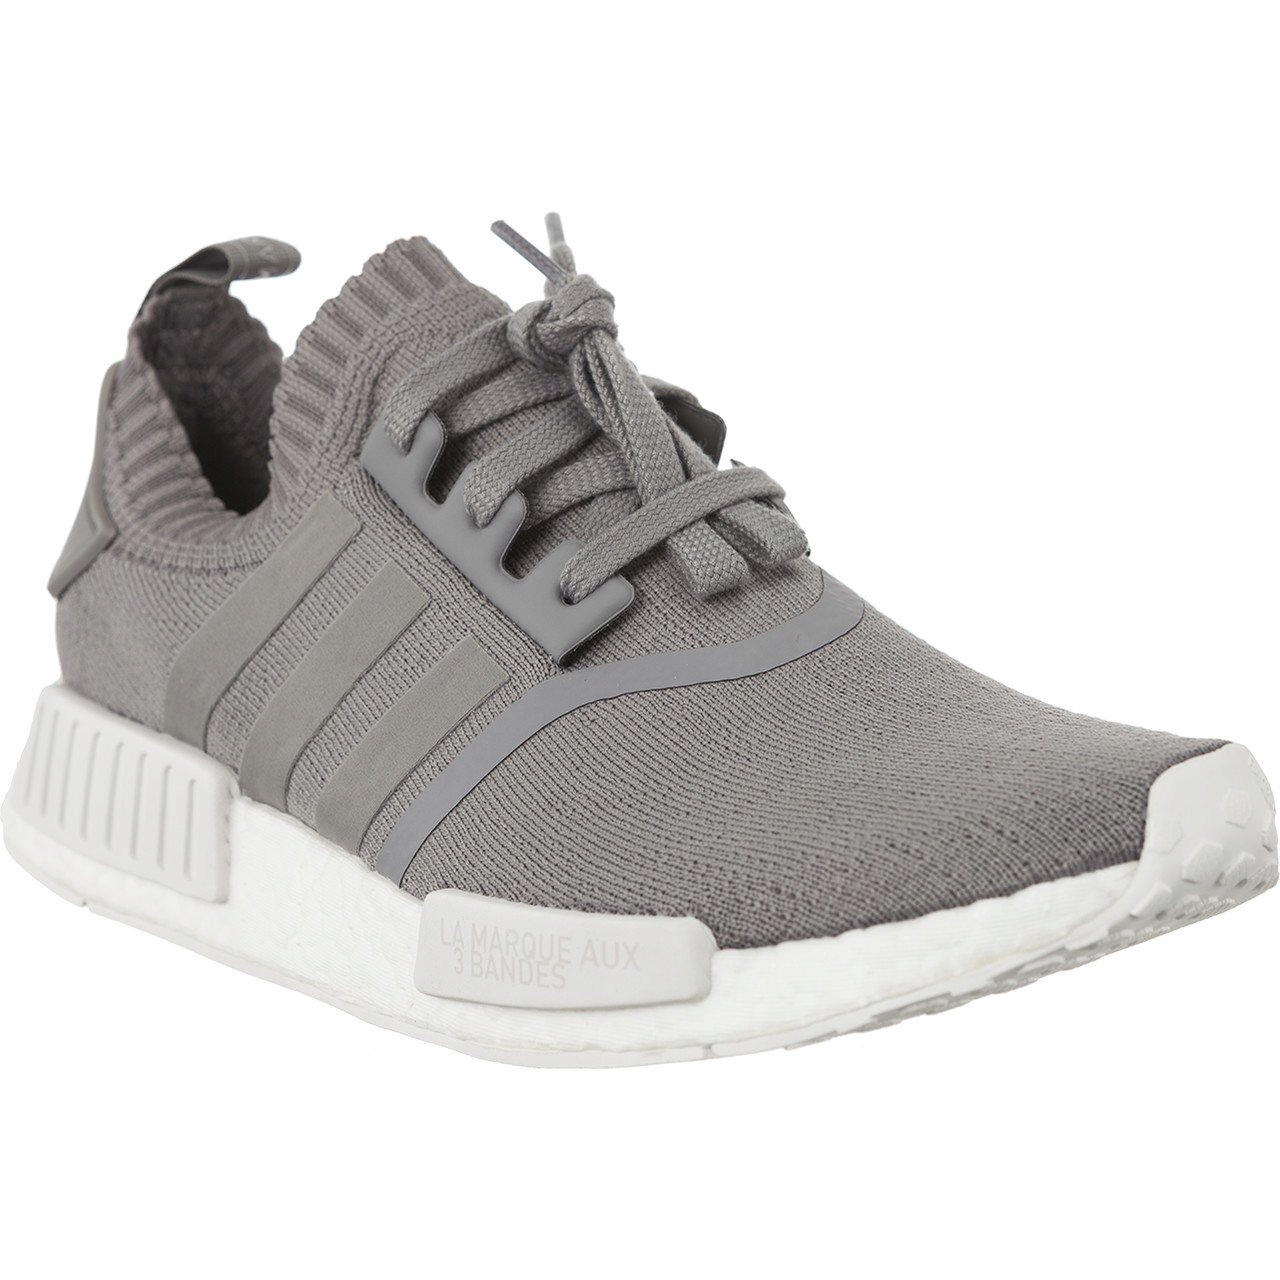 2f8e7cd2 ADIDAS NMD R1 W PK 762 (38 2/3) Uniseks Sneakersy - 7586761629 ...